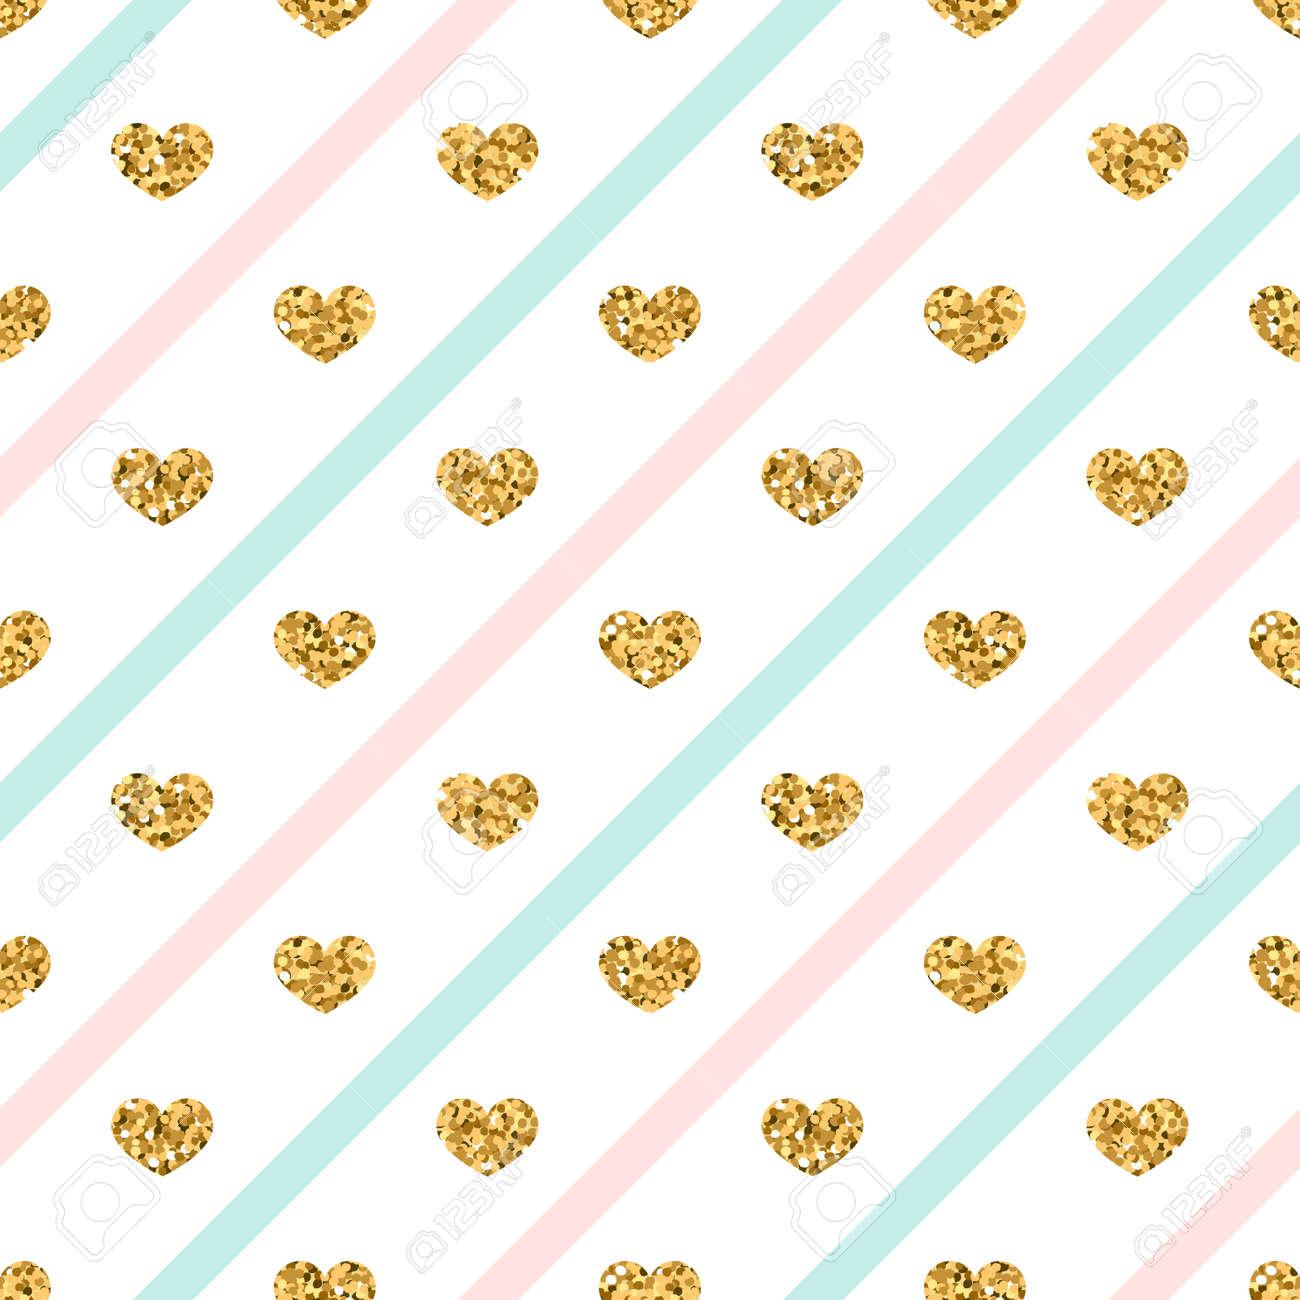 Golden Glitter Love Confetti Hearts On White Blue Pink Line Background